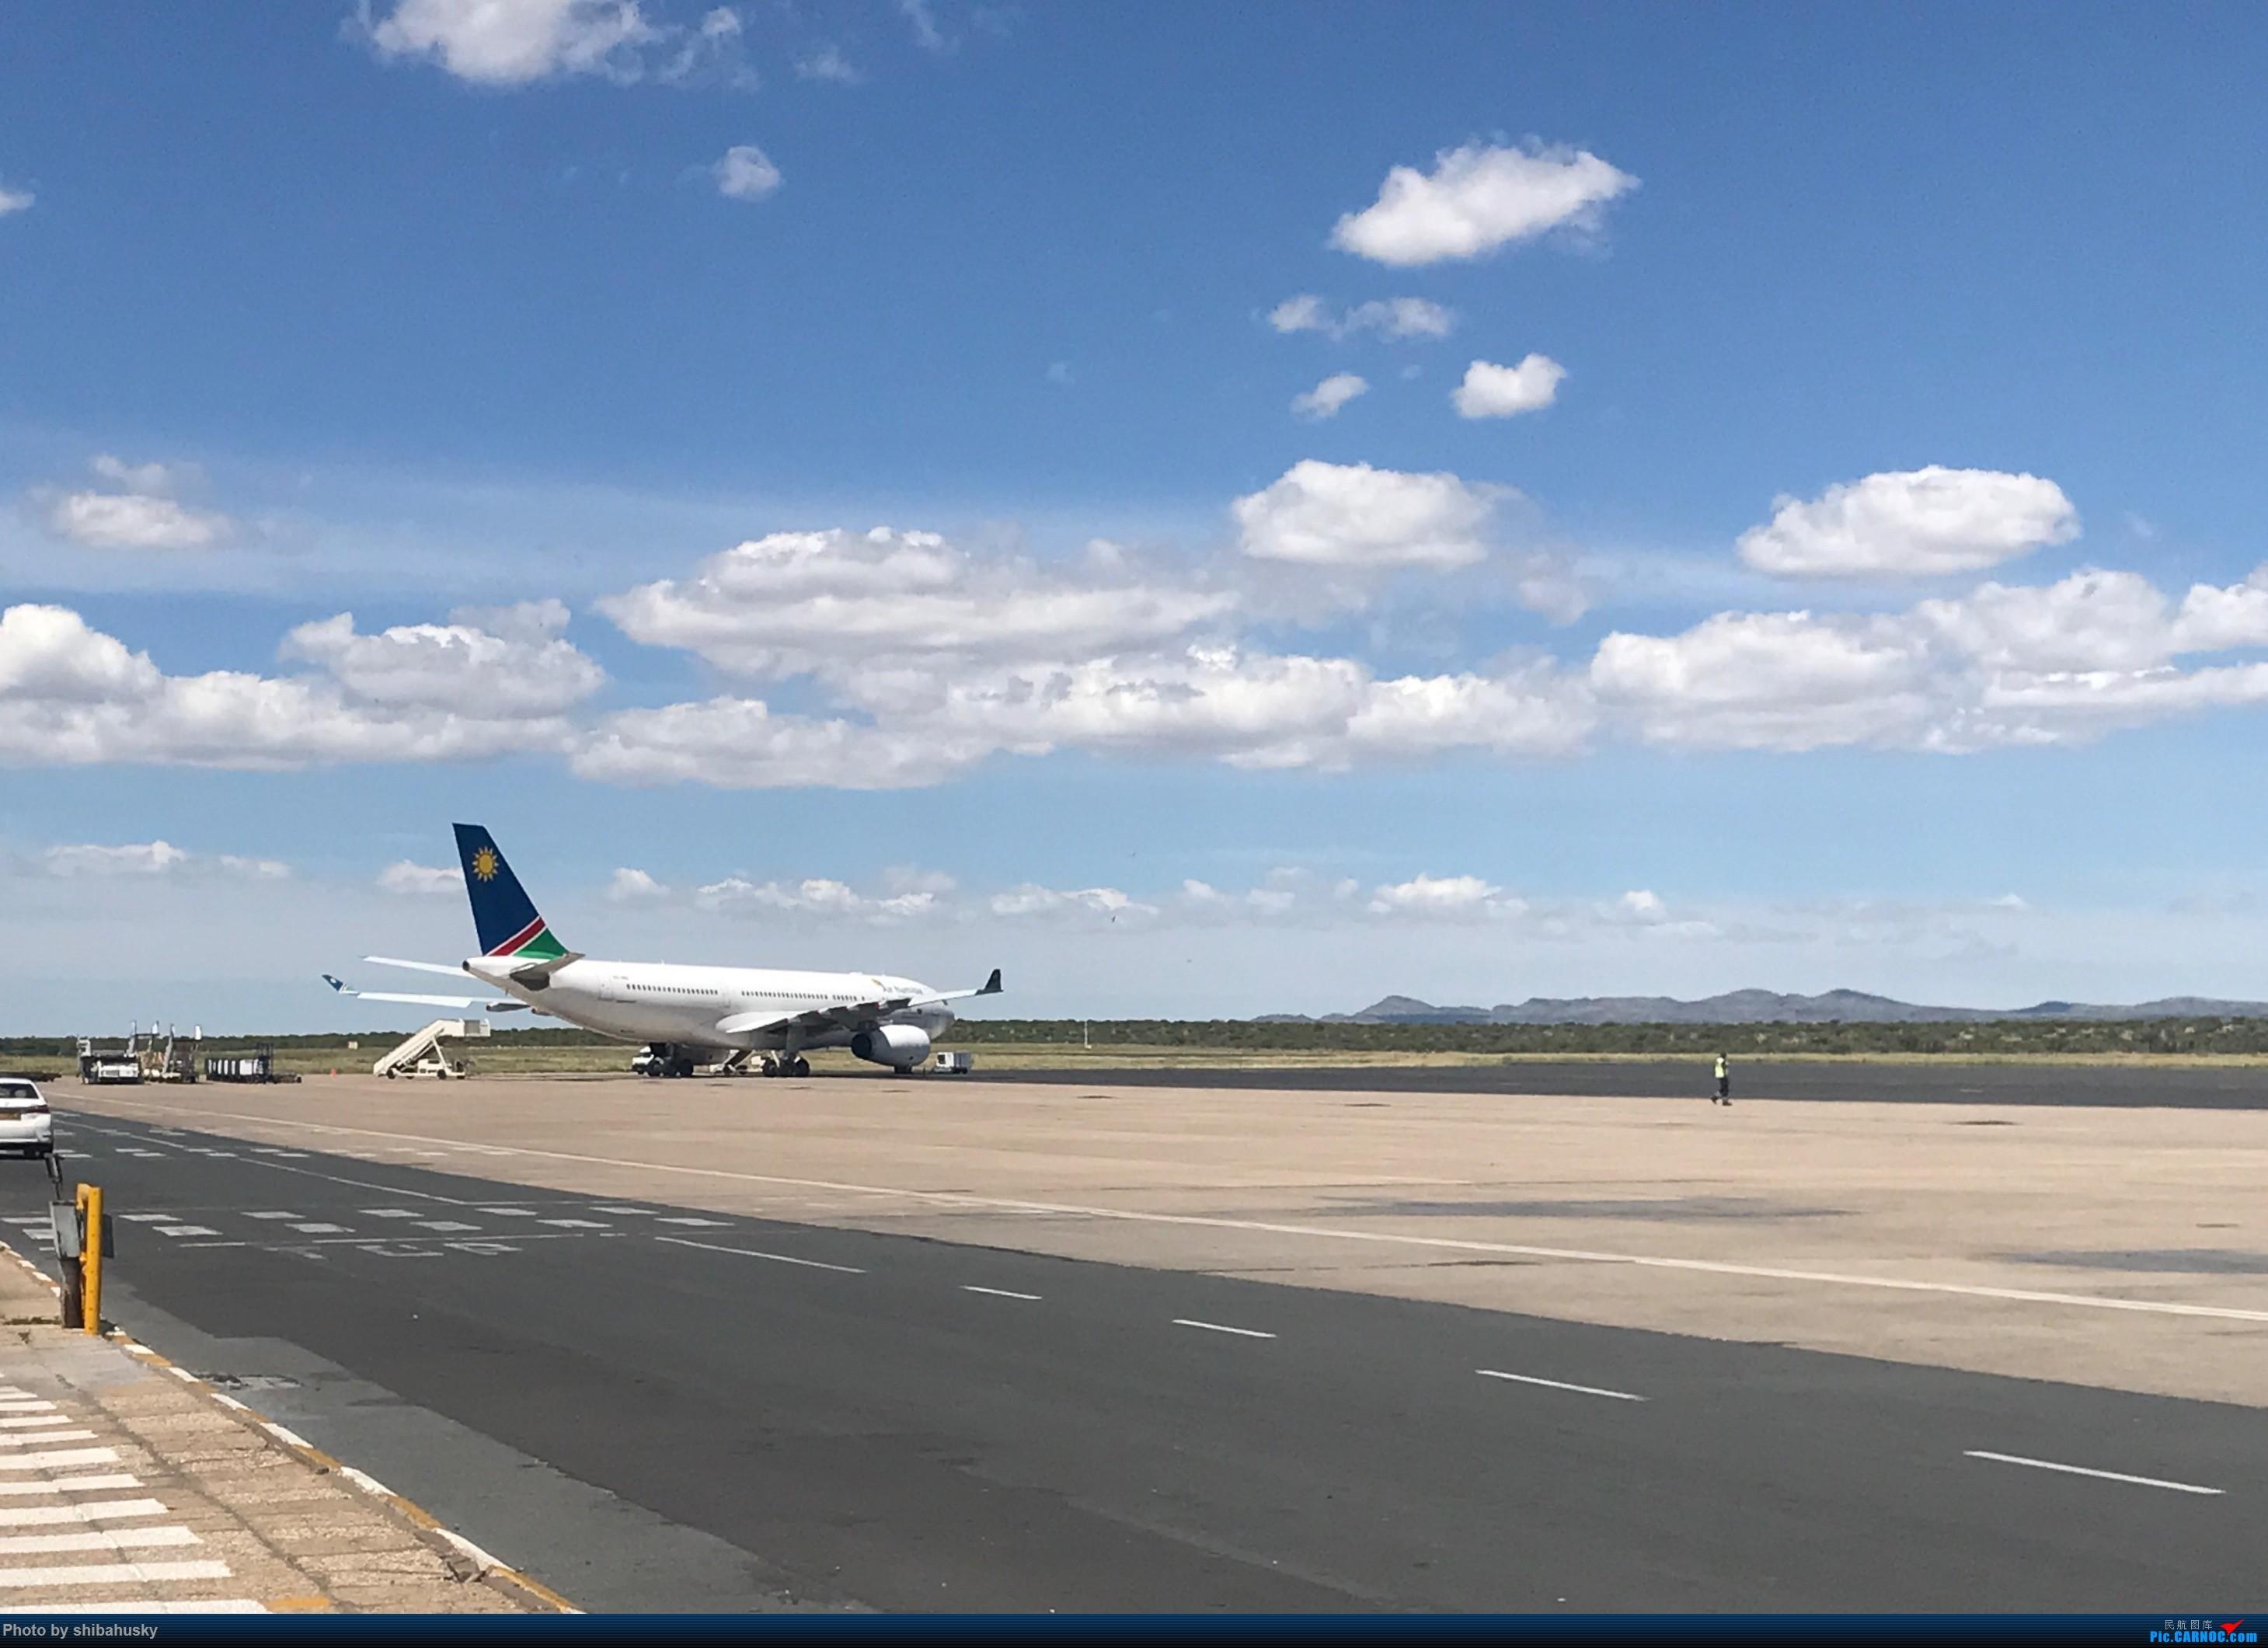 Re:新人第一帖 WVB-WDH-DOH-CDG-SOU 圣诞纳米比亚游记 体验稀有机型加辗转回英 AIRBUS A330-200 未知 温得和克机场